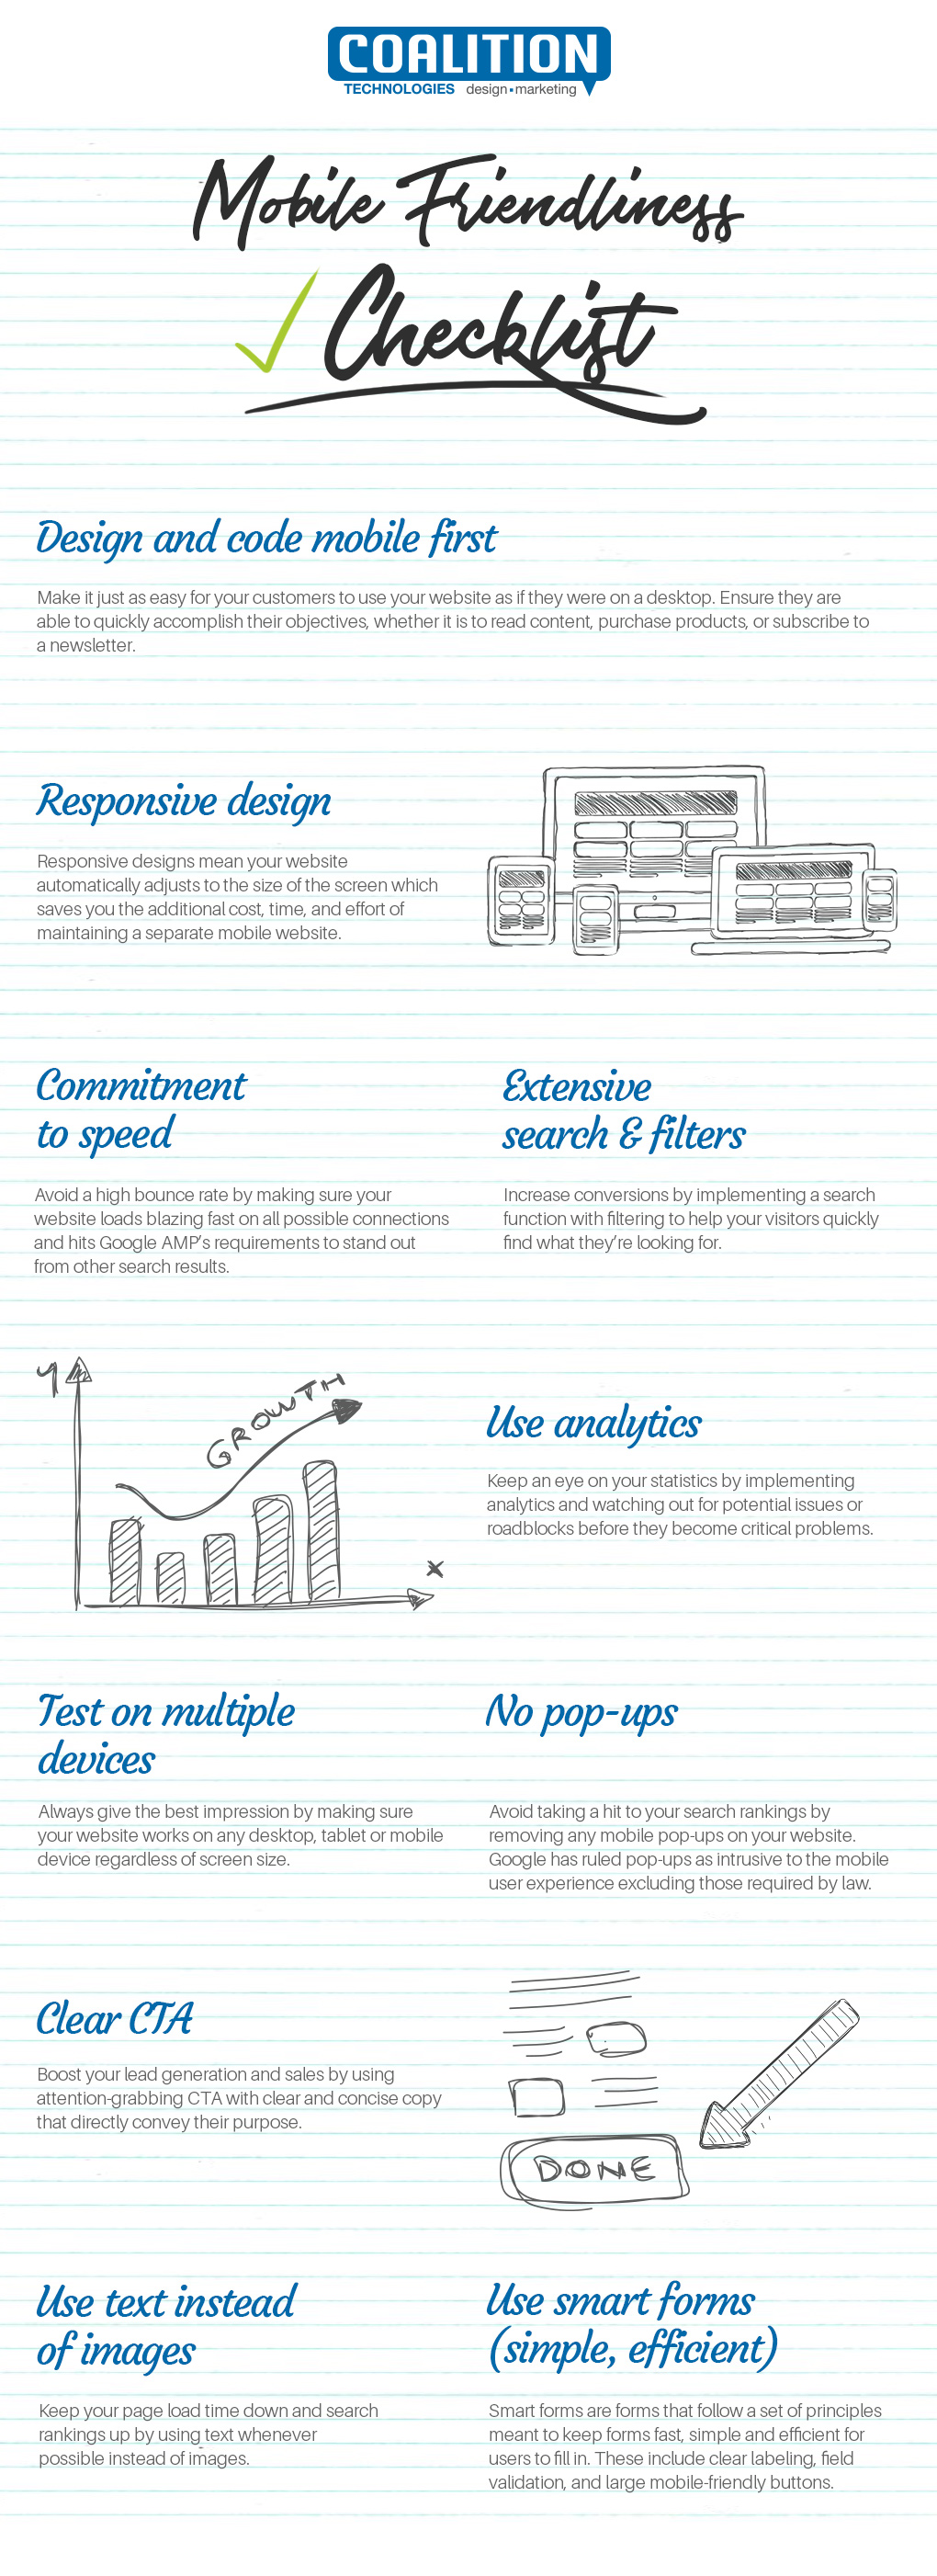 Mobile Friendliness Checklist Infographic